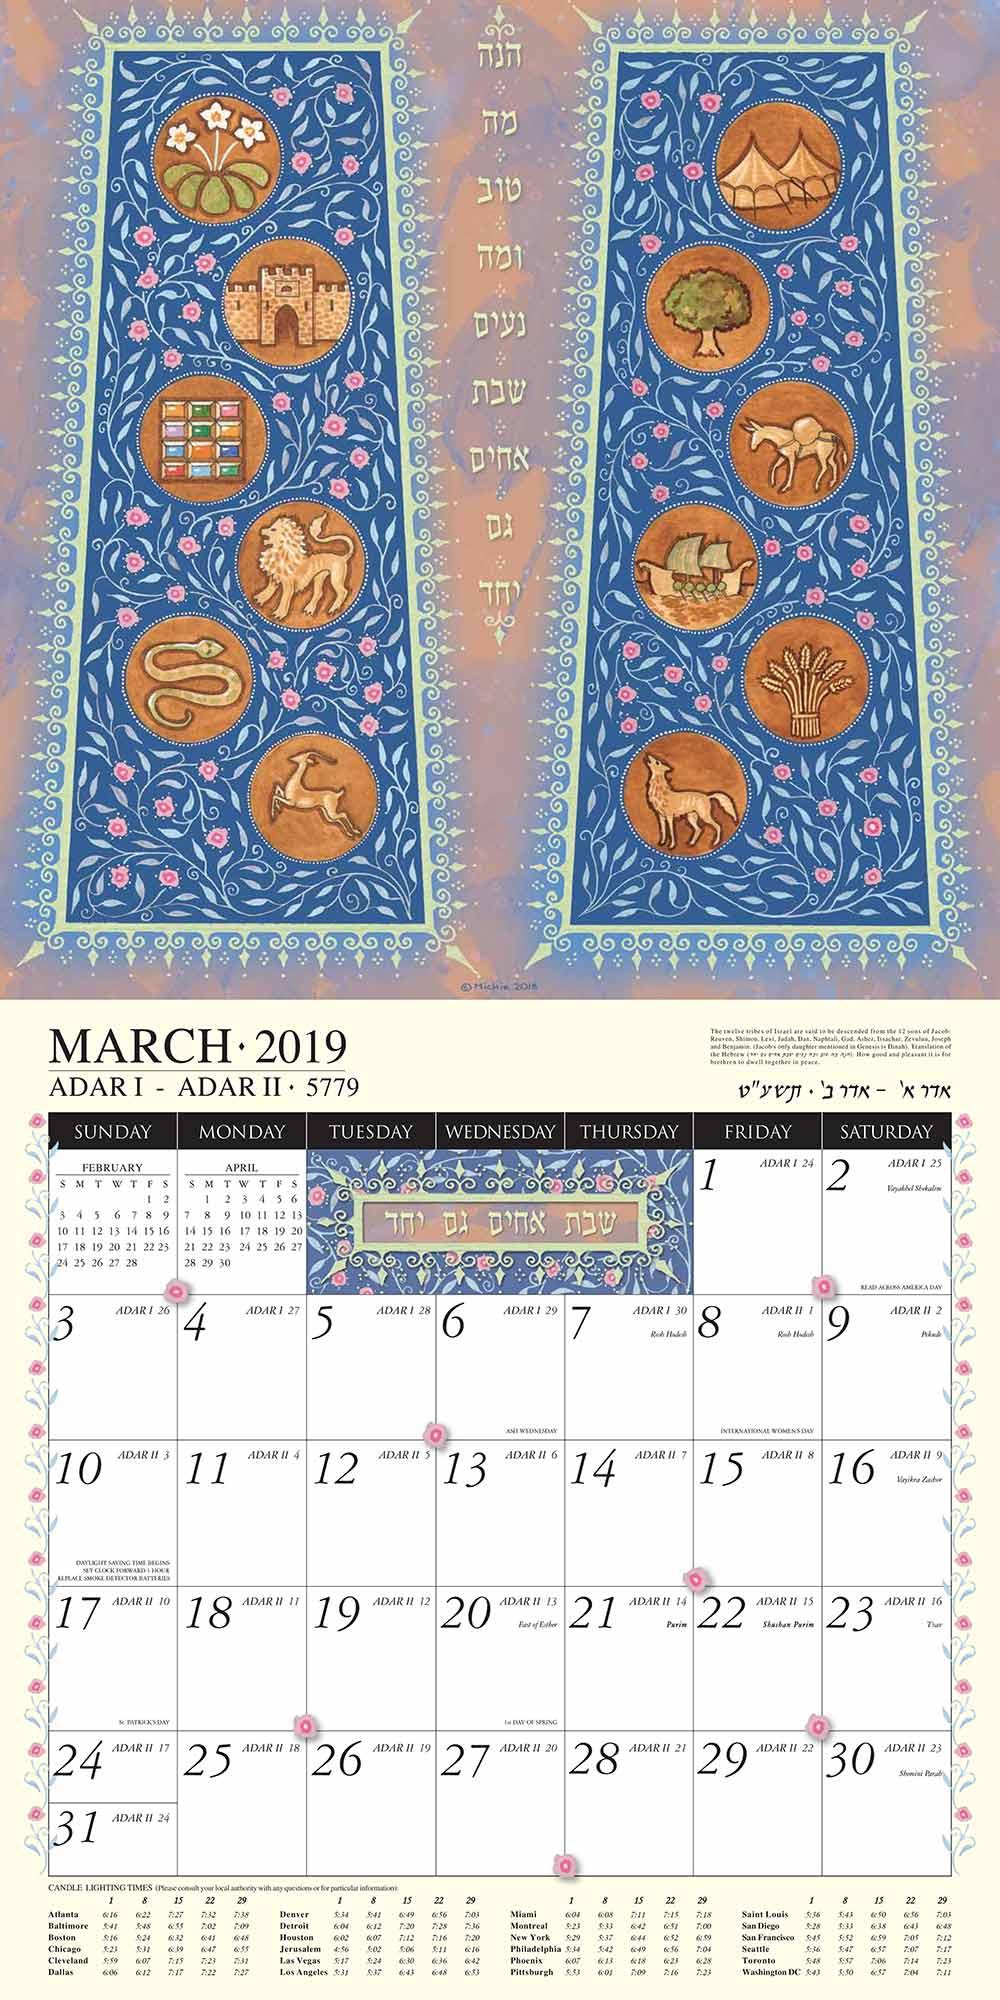 Jewish Art Calendar 2019 by Mickie Caspi March